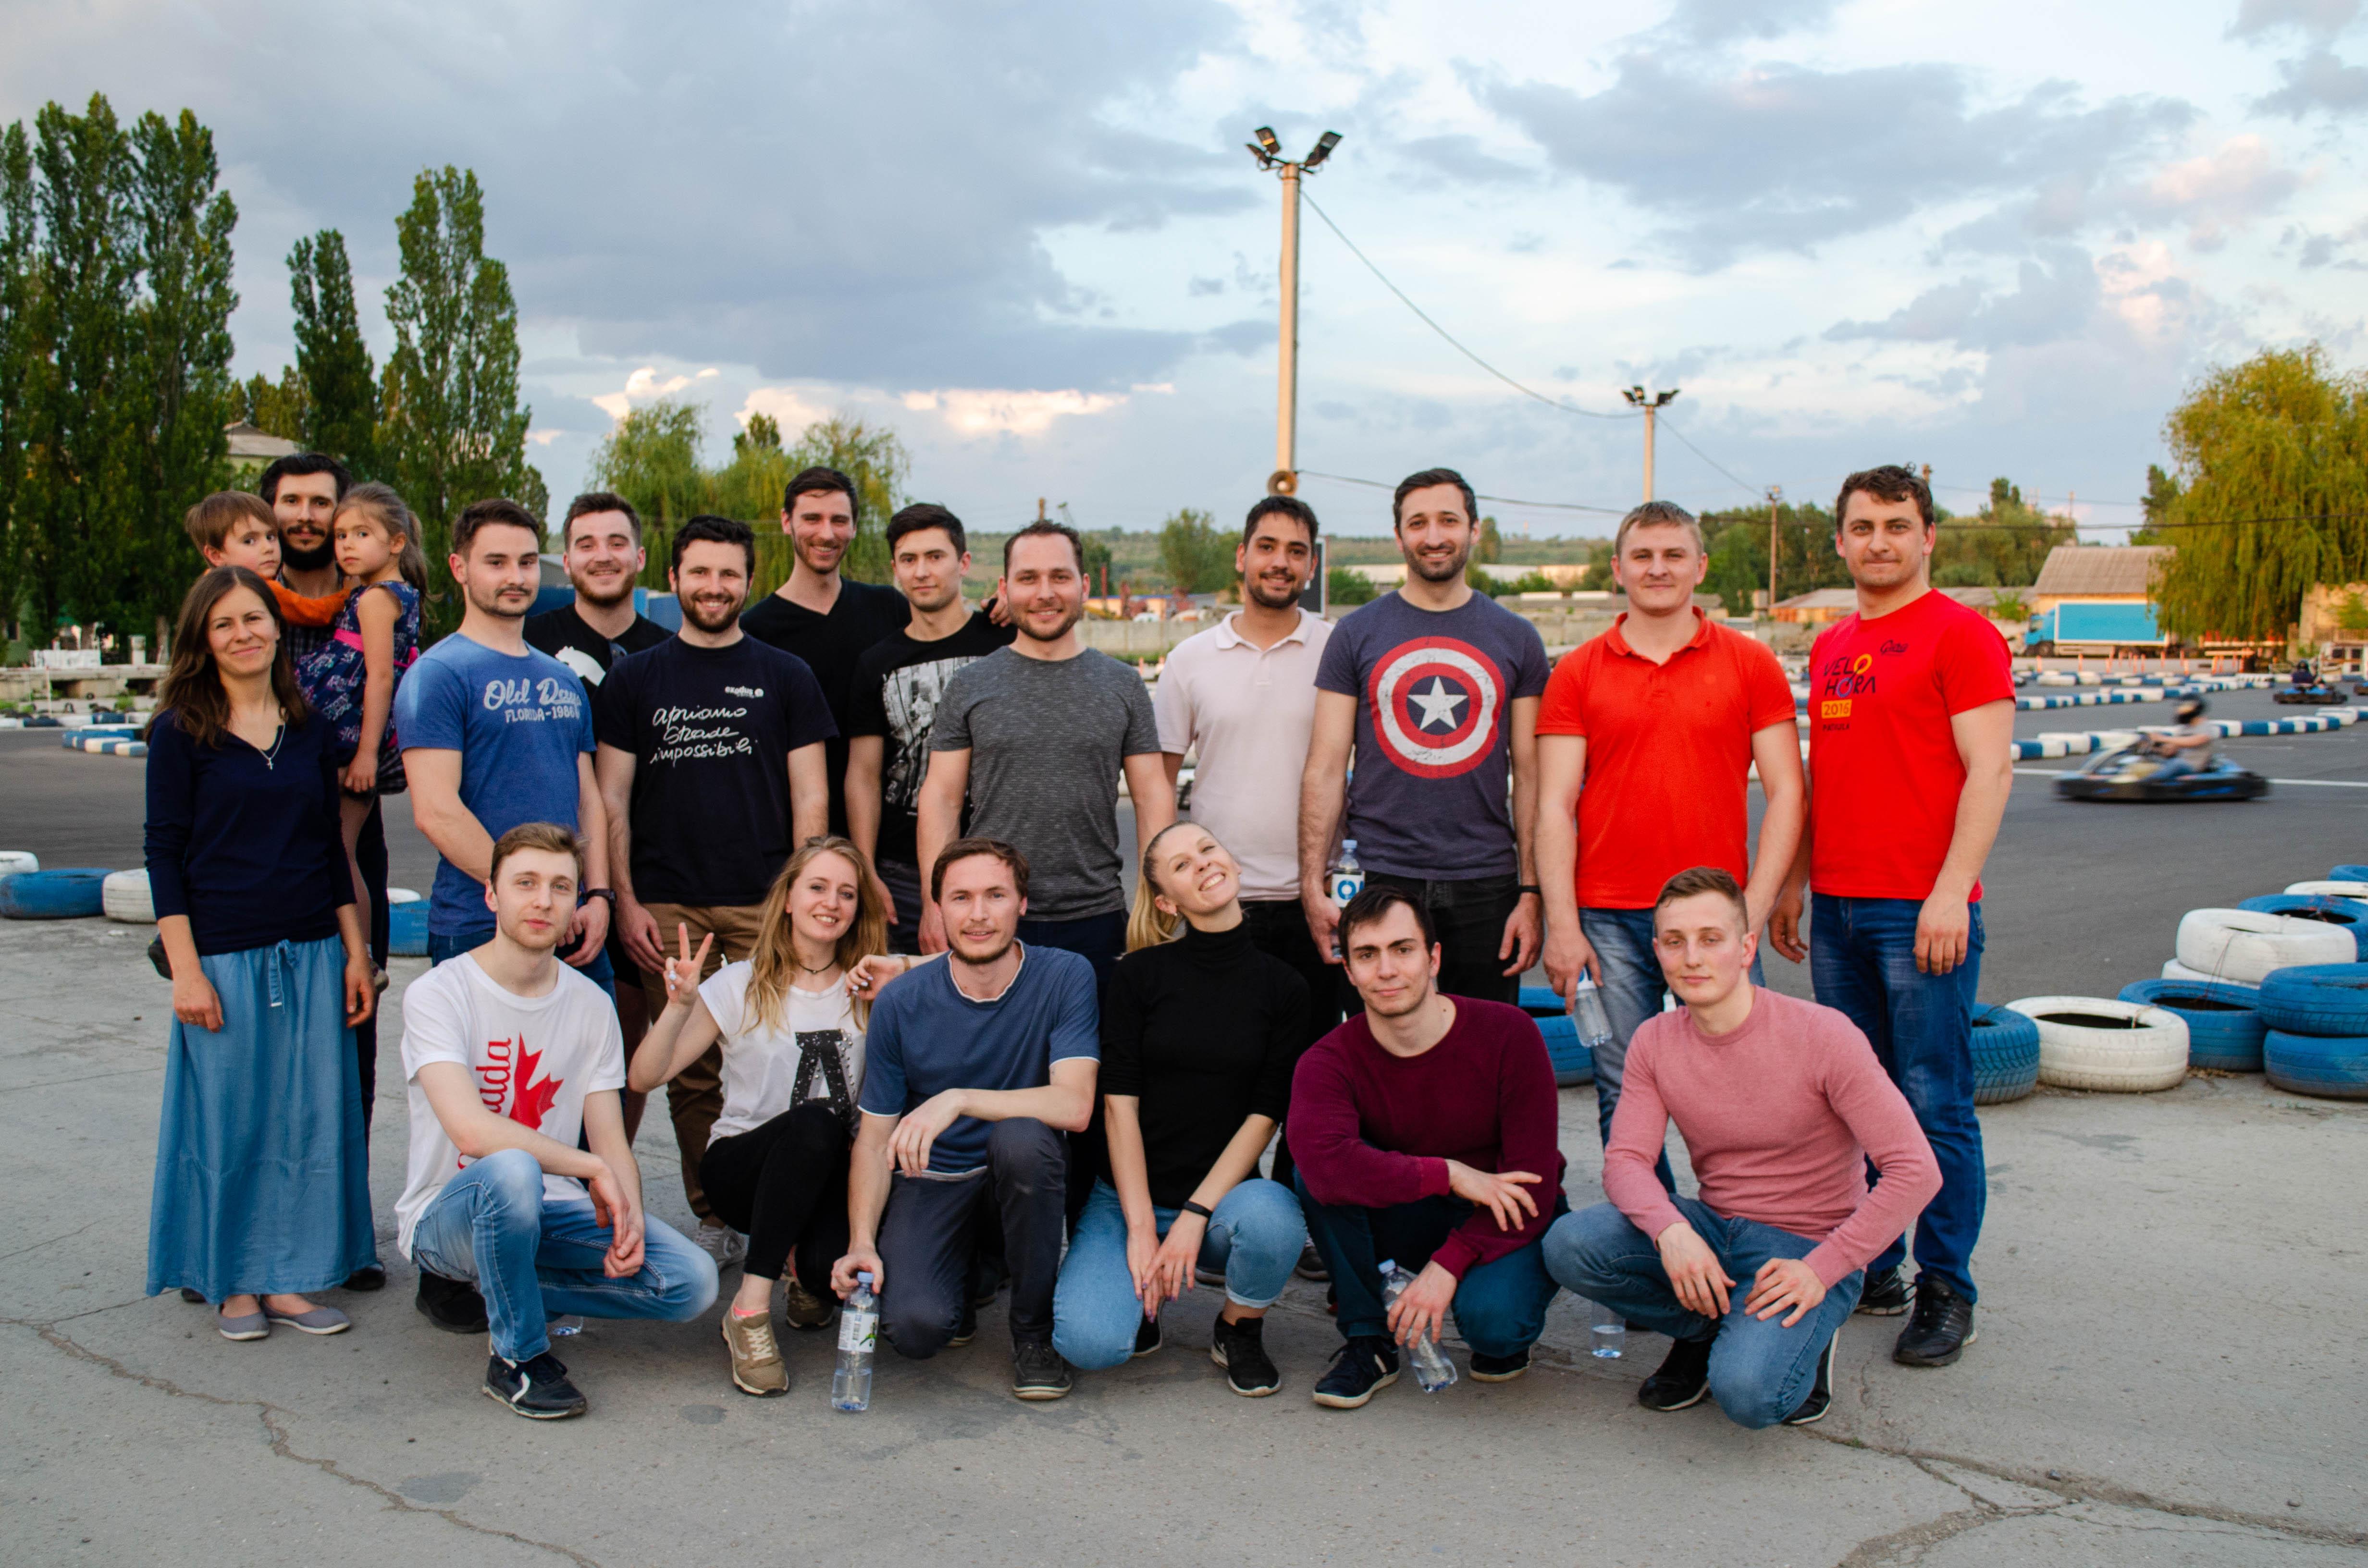 ISD Java Developers Team Carting